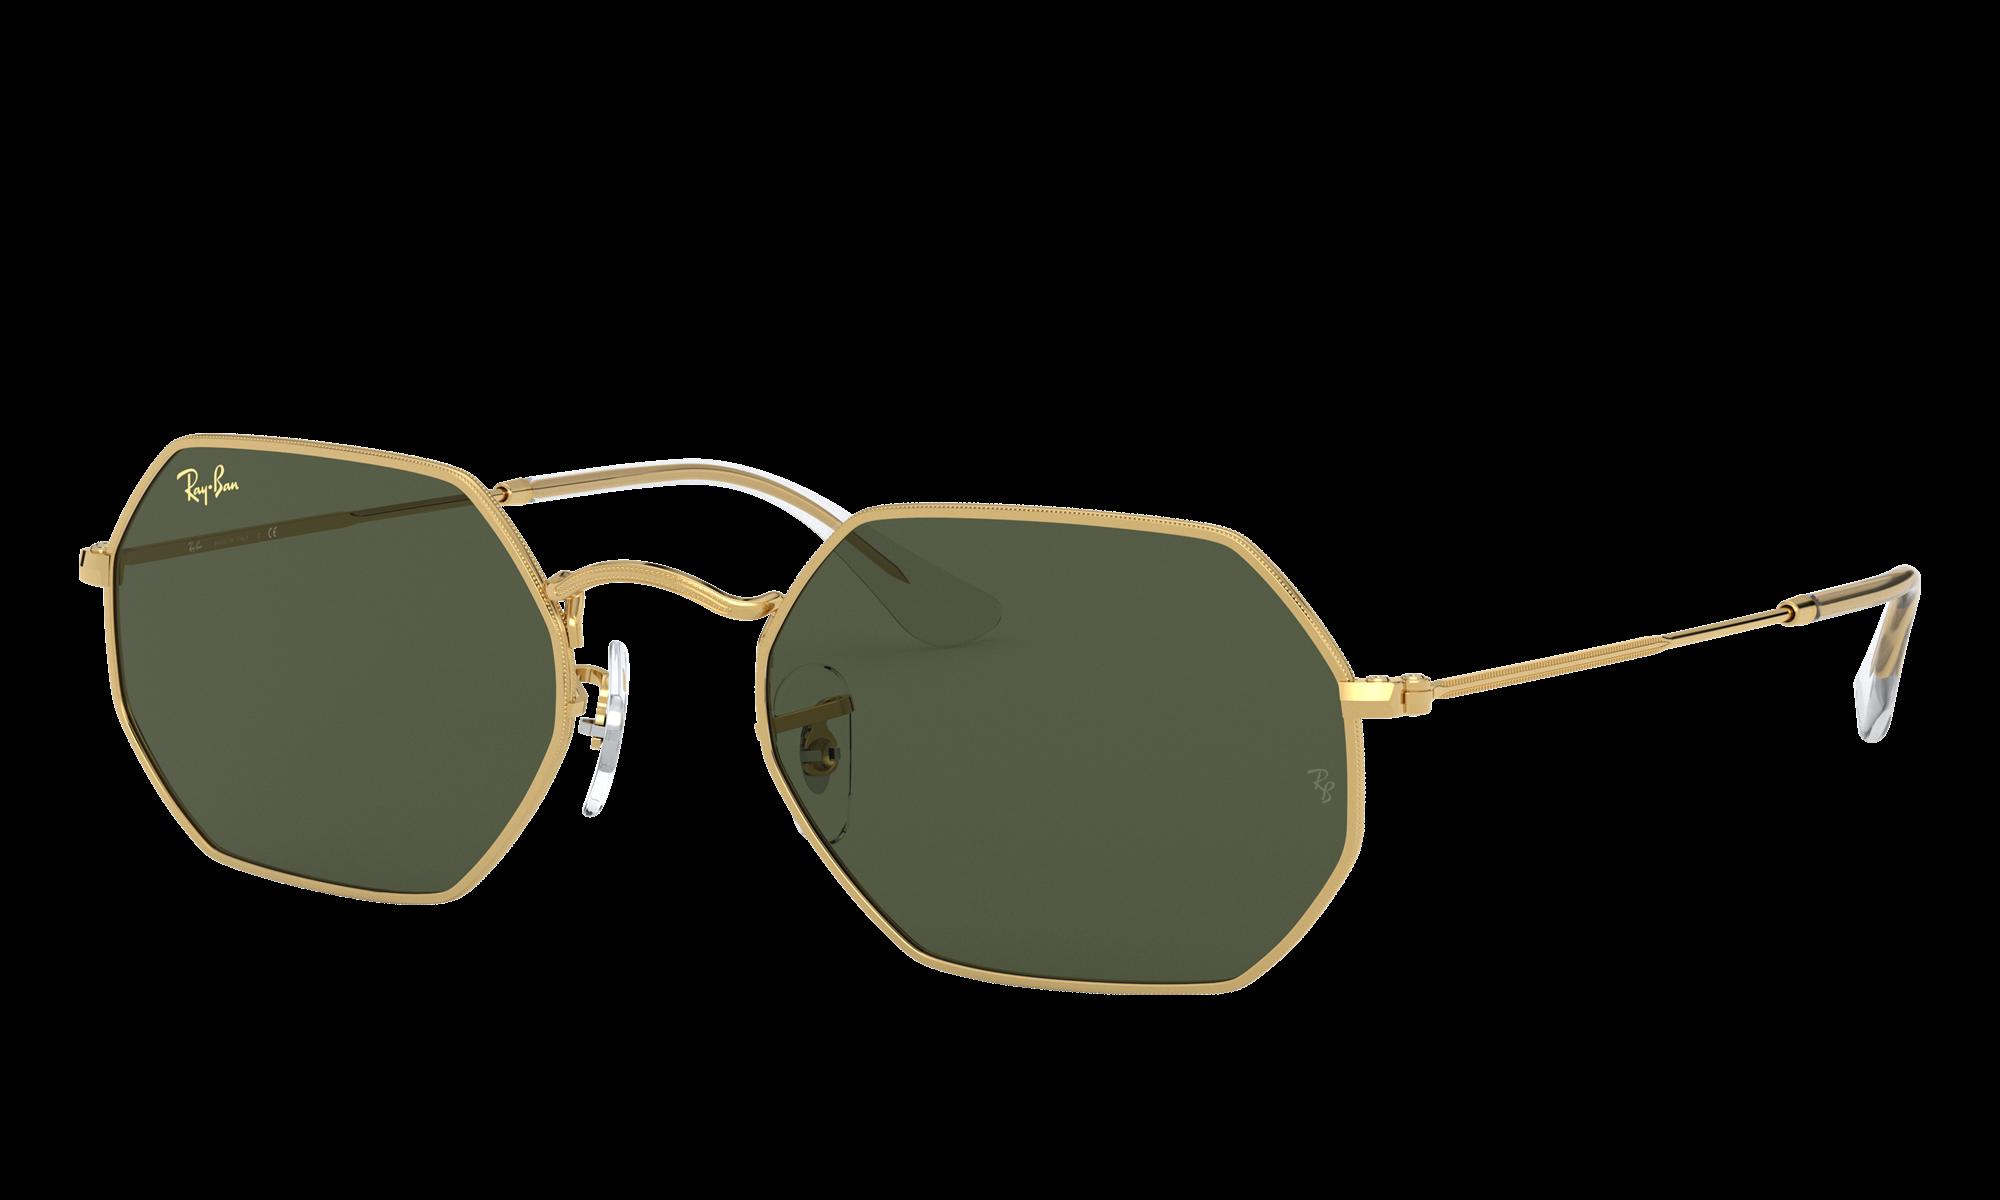 1960s Sunglasses | 70s Sunglasses, 70s Glasses Ray-Ban Unisex Octagonal Legend Gold Gold Size Standard $154.00 AT vintagedancer.com